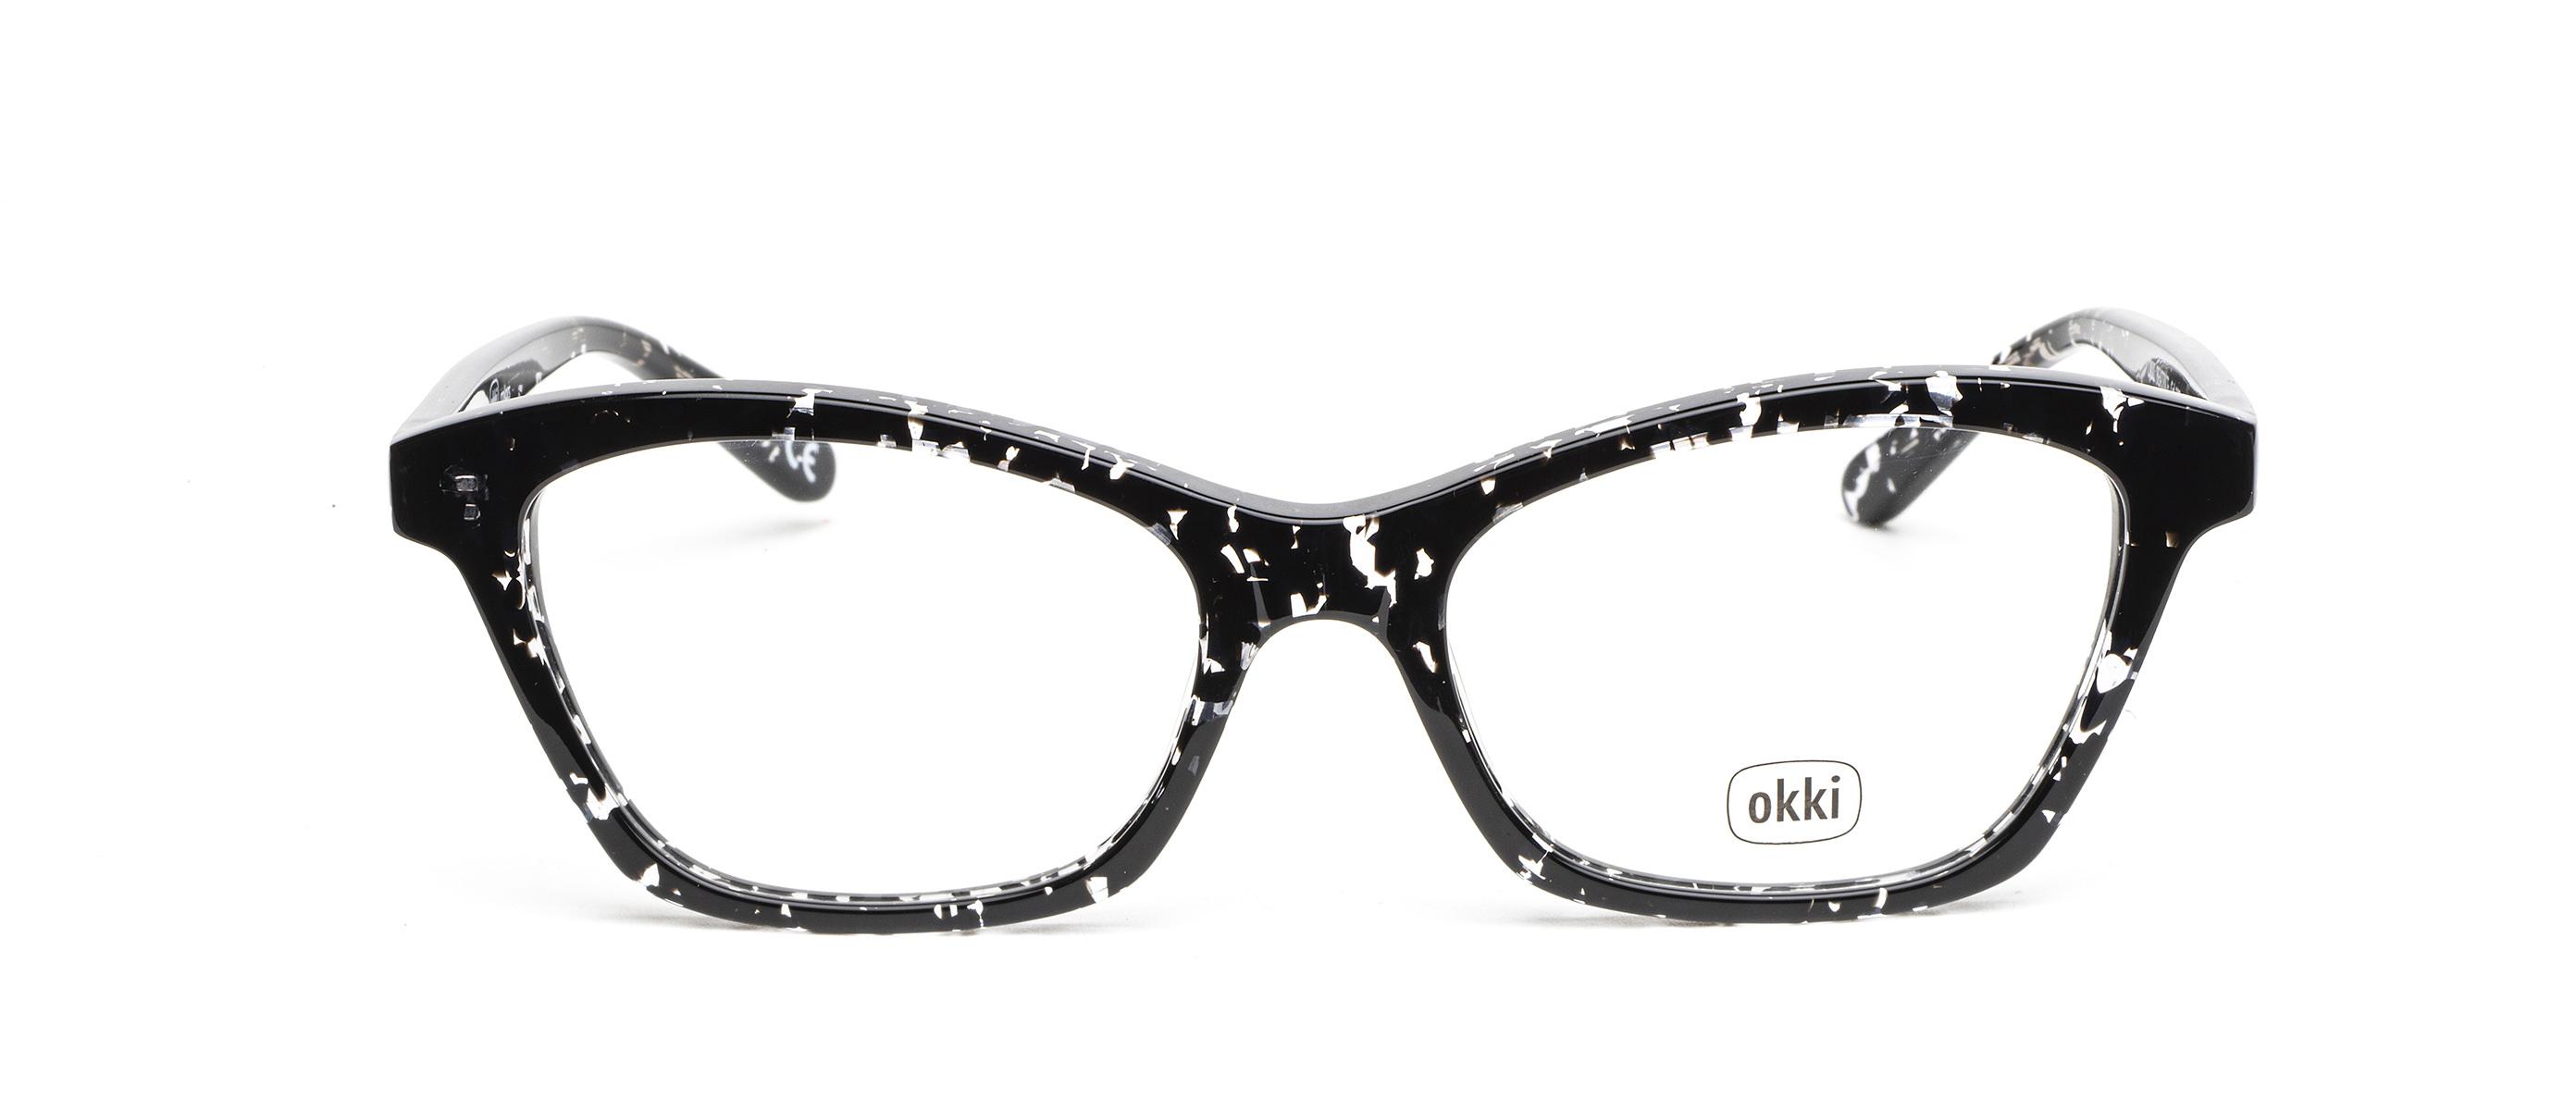 Montatura per Occhiali OKKI Colors